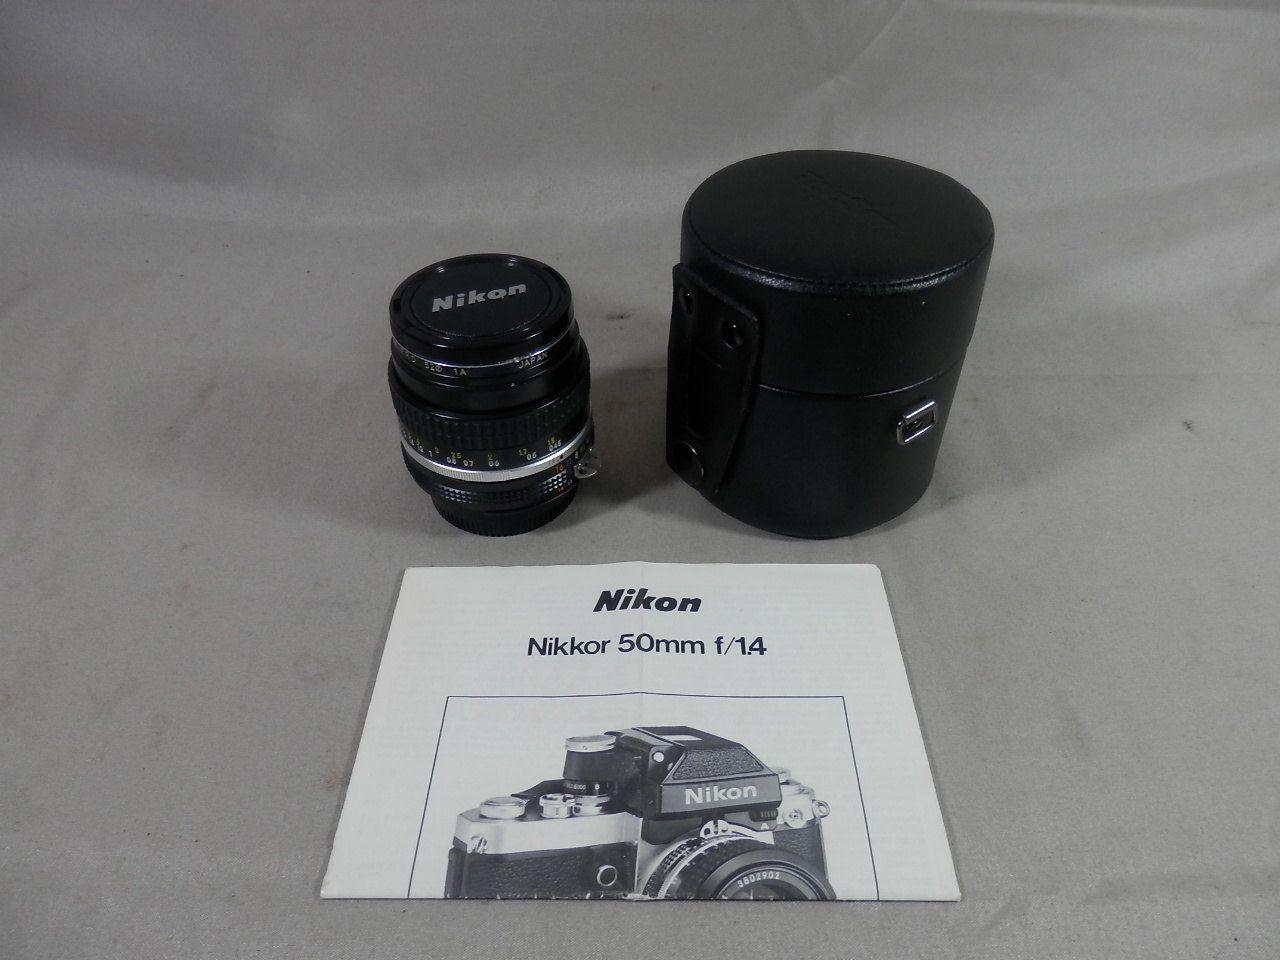 Vintage Nikon Nikkor 50mm F 1 4 Ai S 1 1 4 Camera Lens Manual Focus Front Rear Caps With Telesor Lens Case Nikon Camera Lens Manual Focus